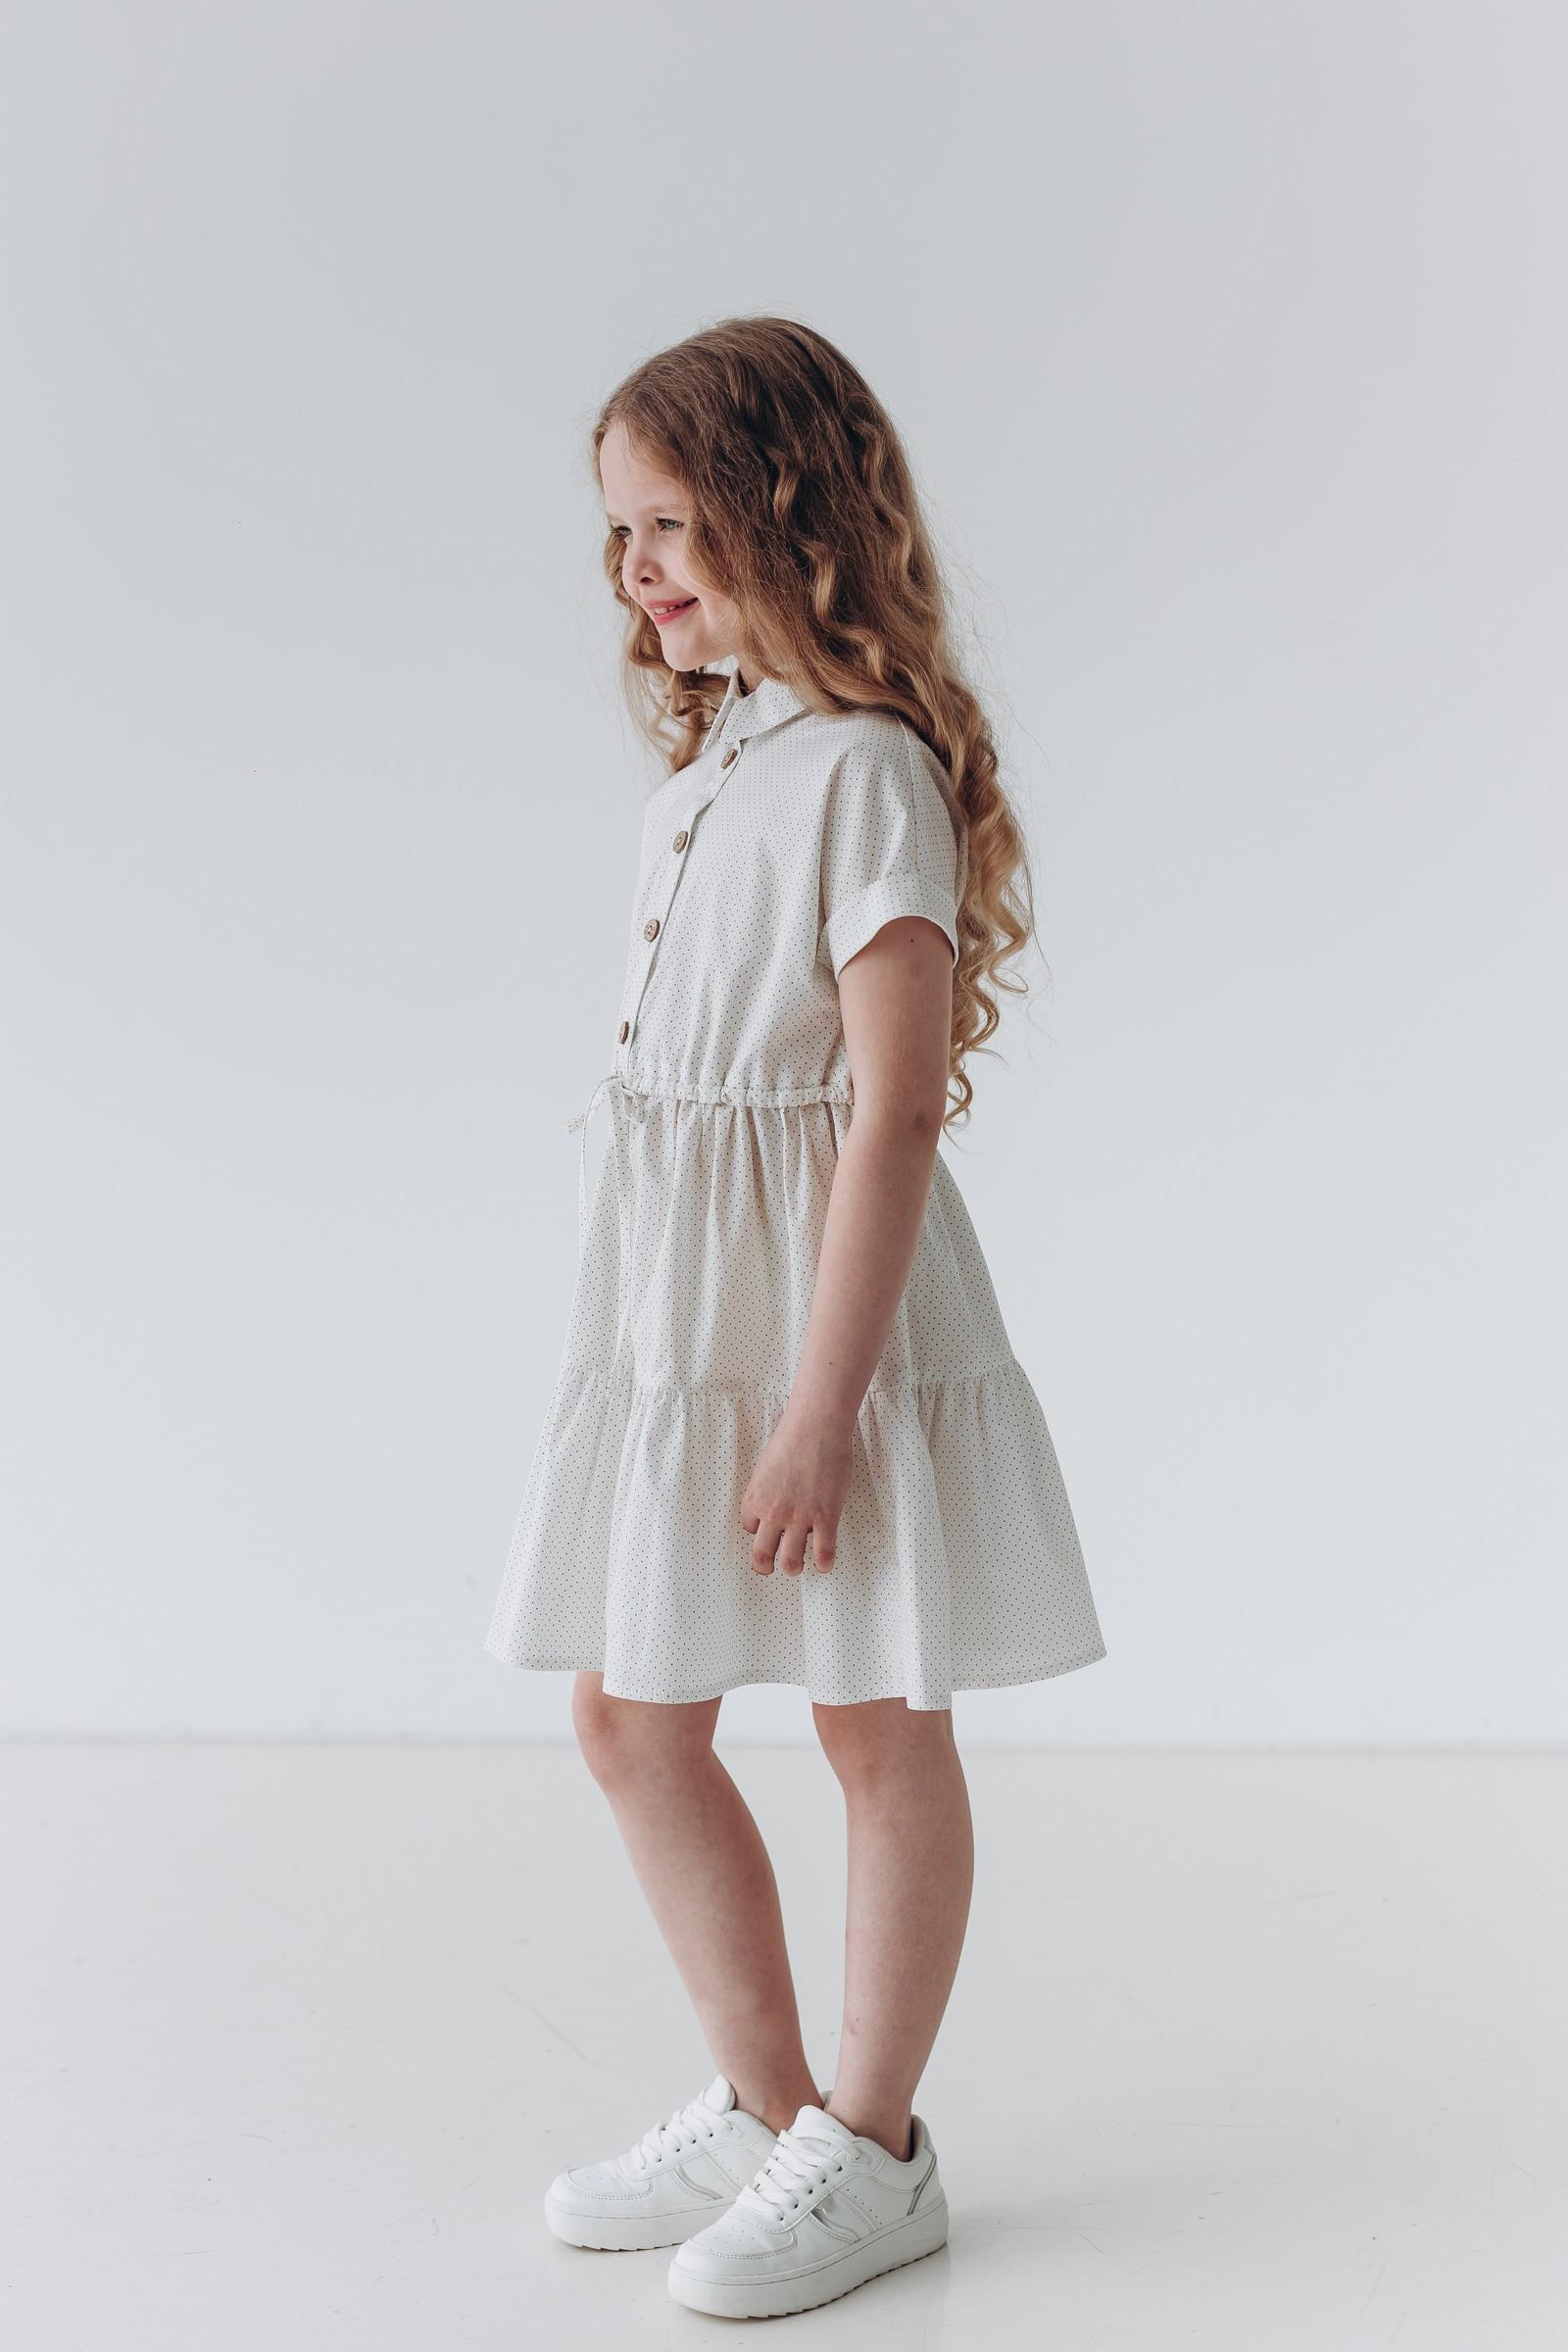 Плаття Ніколеса, фото №2